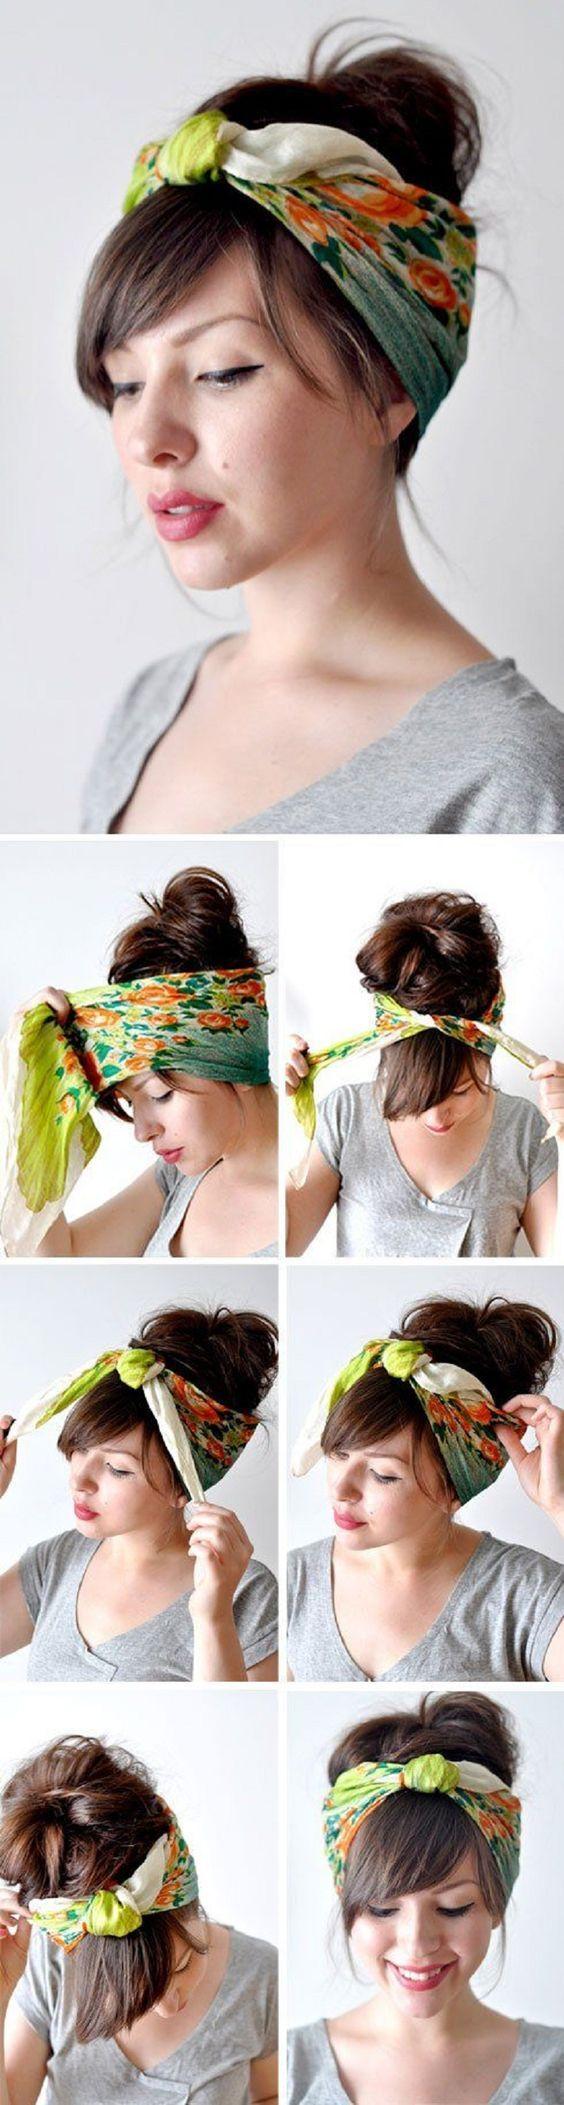 Head Scarf Tutorial- 15 Cool Headwrap Scarf Tutorials for Summer